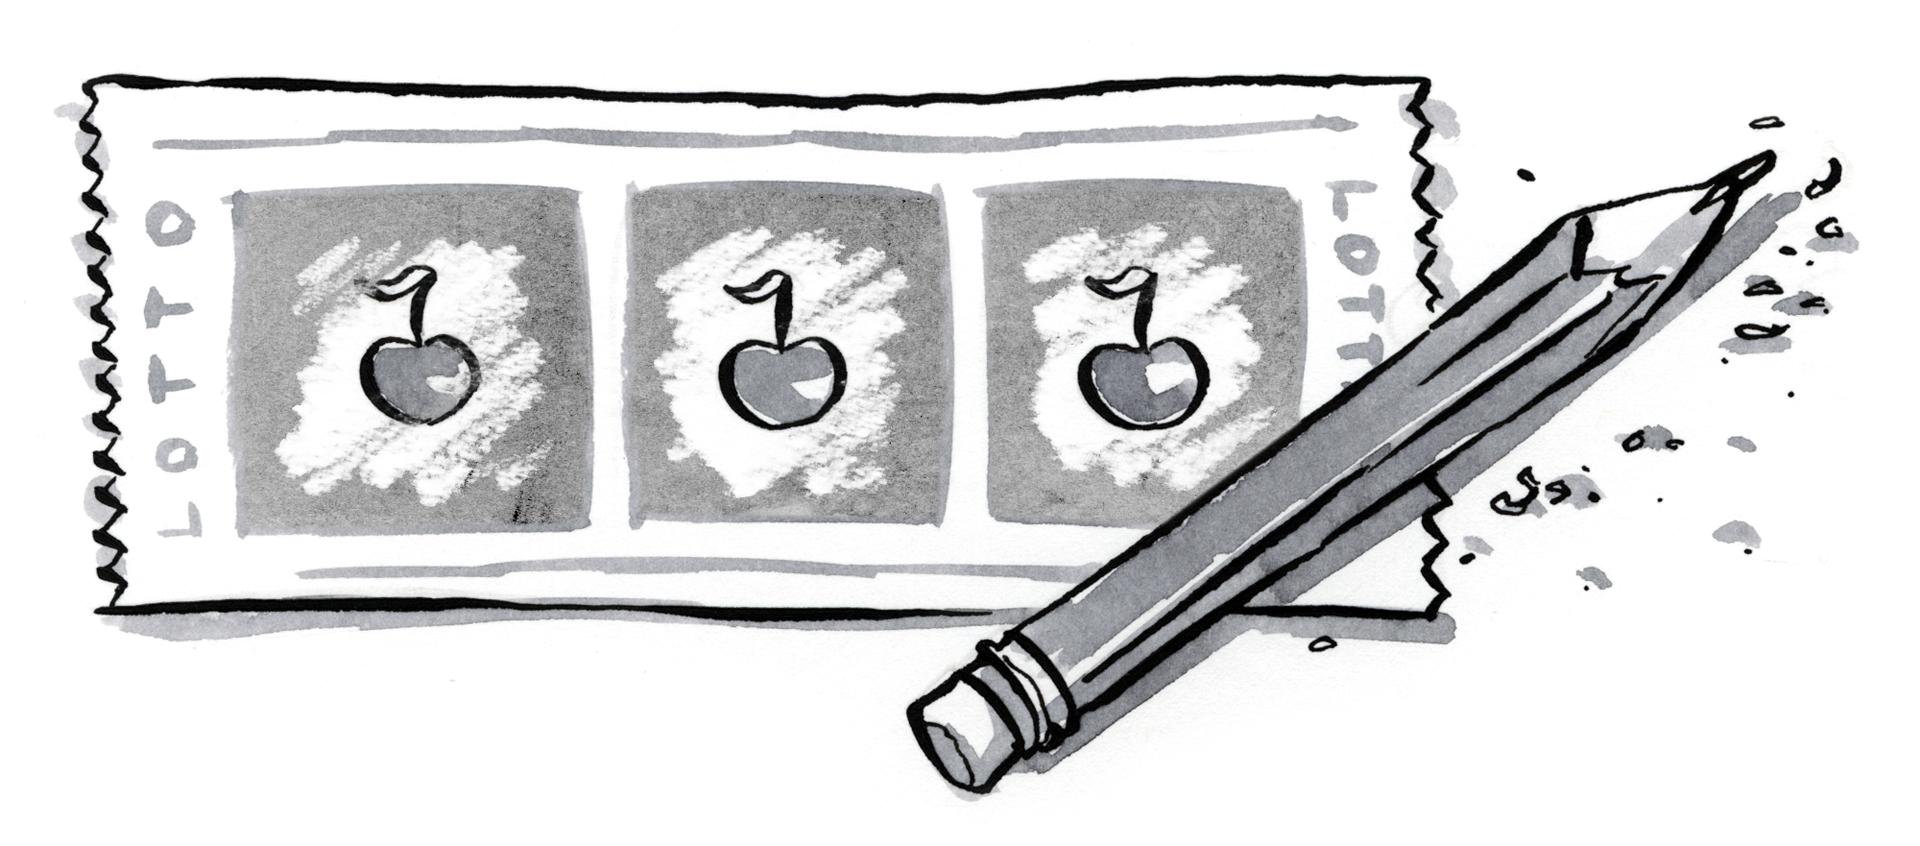 Sketching: the Visual Thinking Power Tool